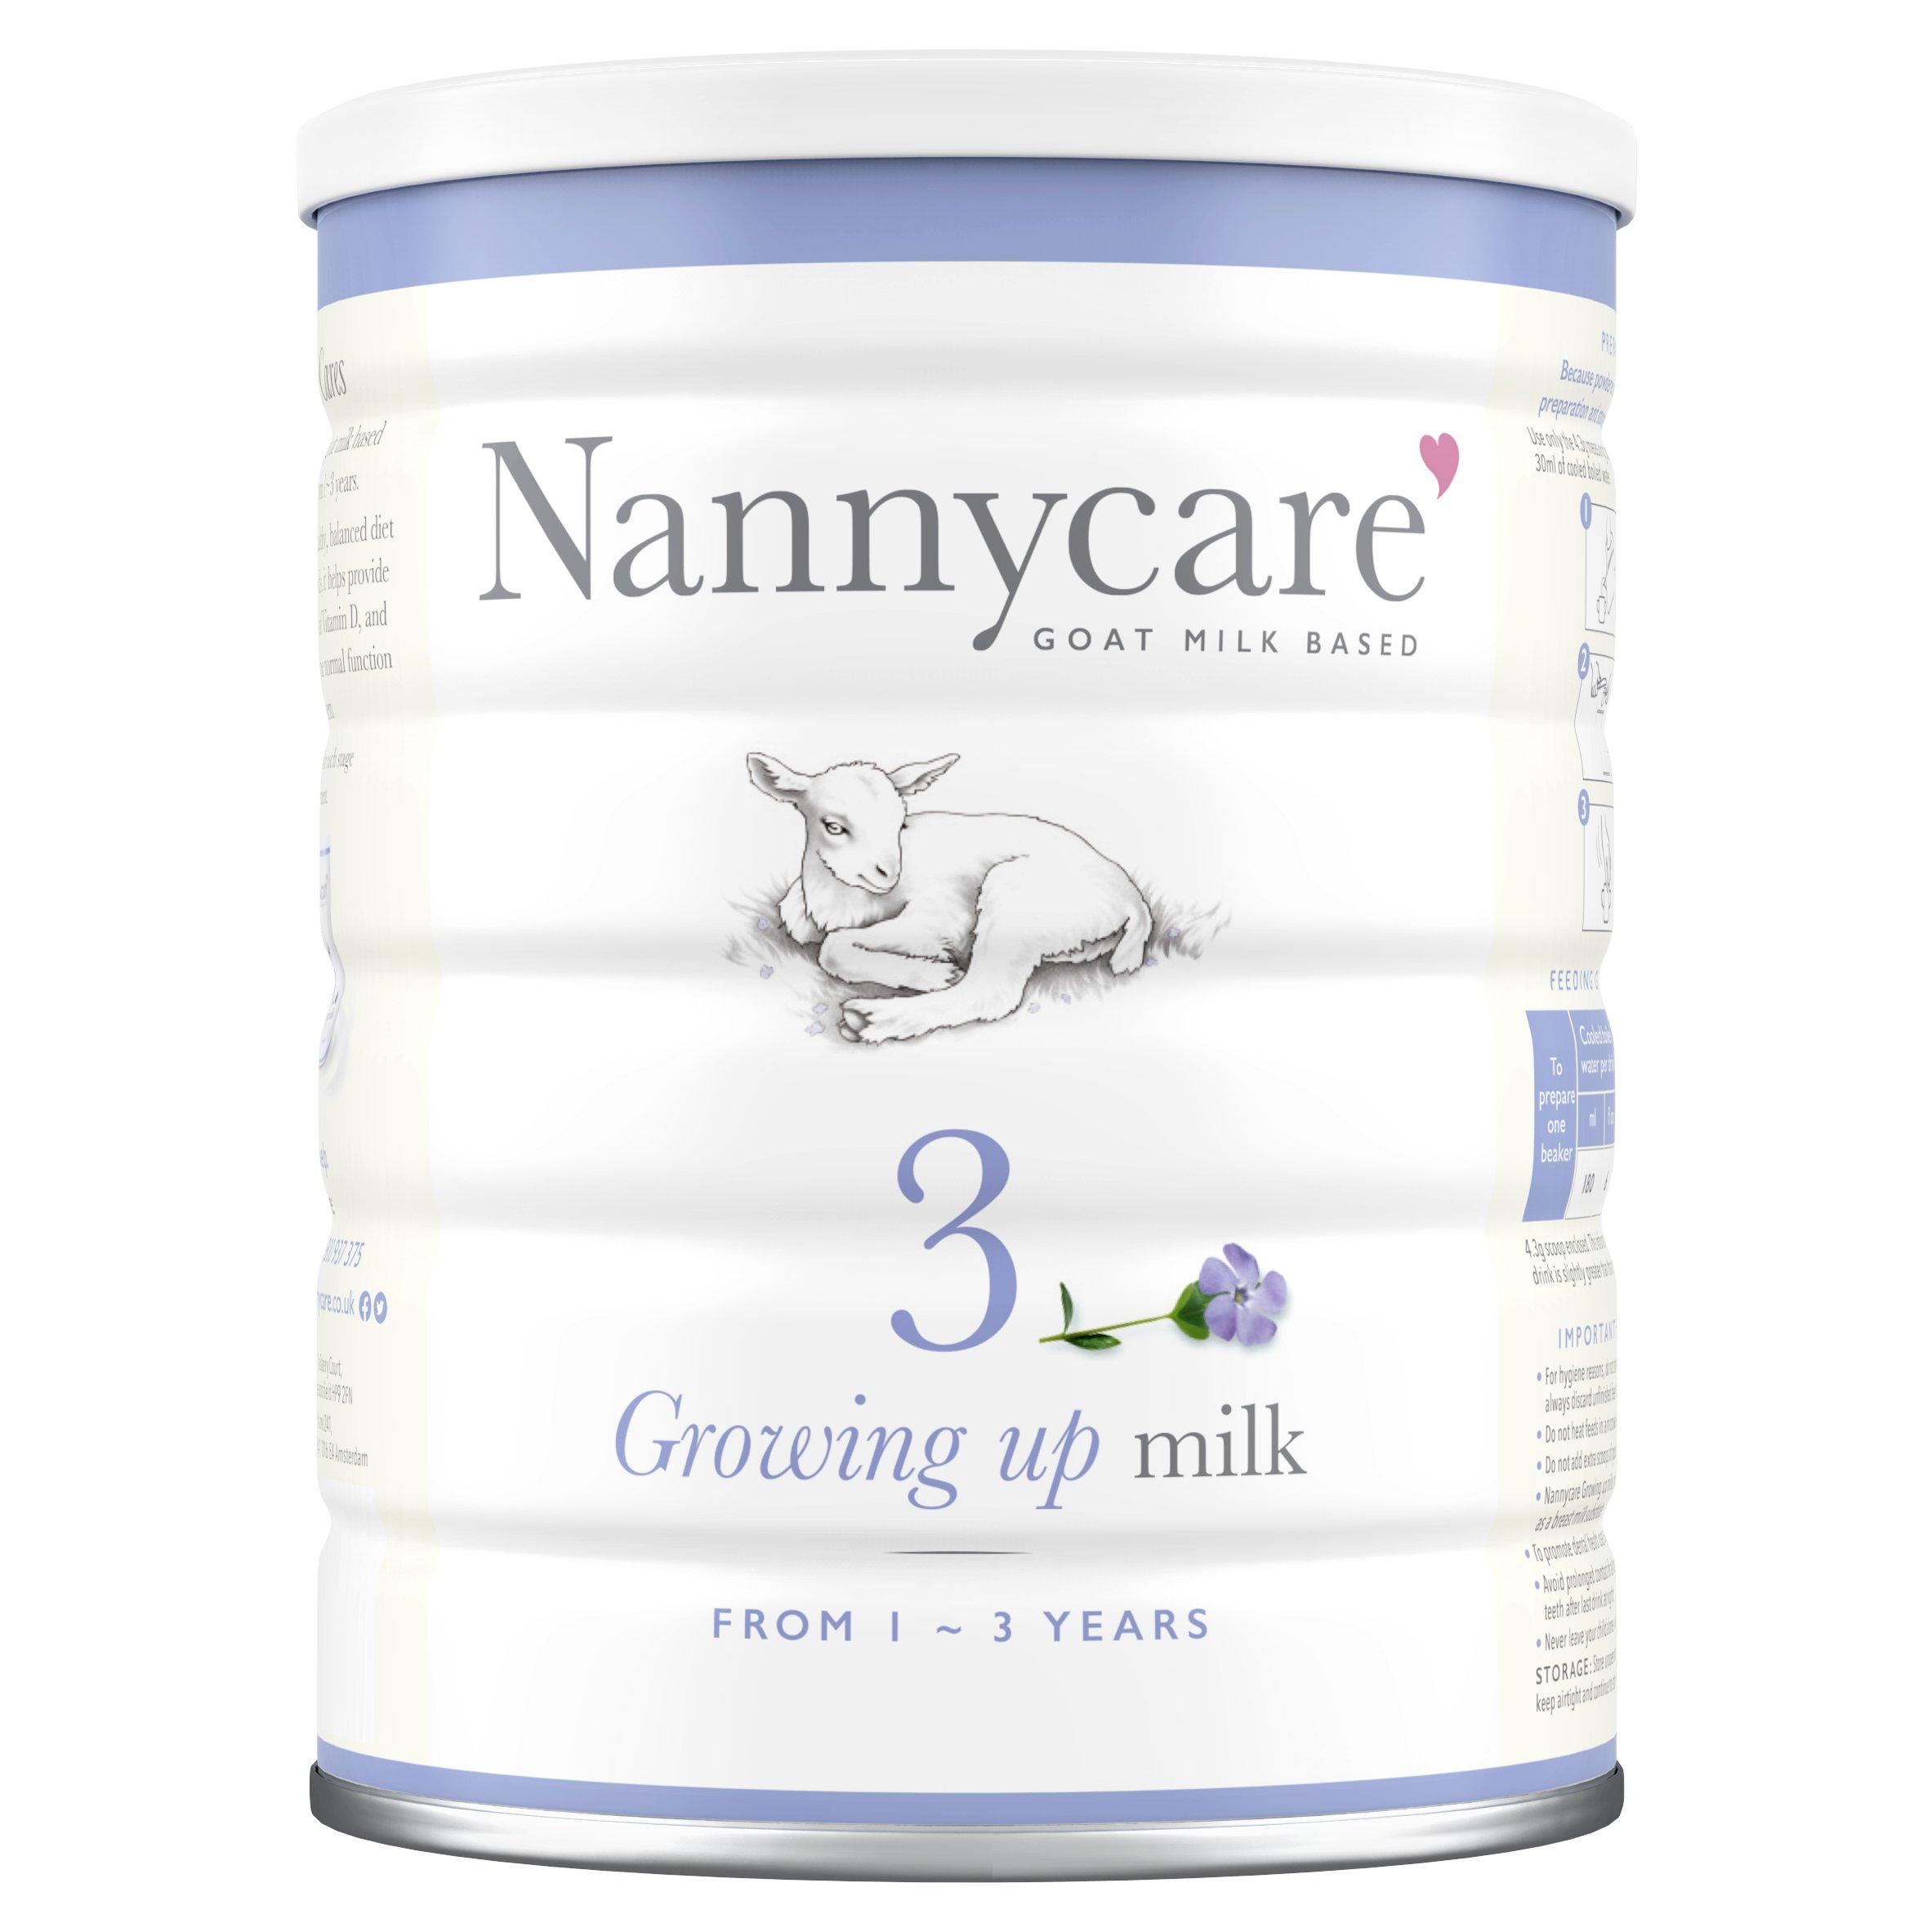 Nannycare 3 Goat Milk Based Growing Up Milk 900G